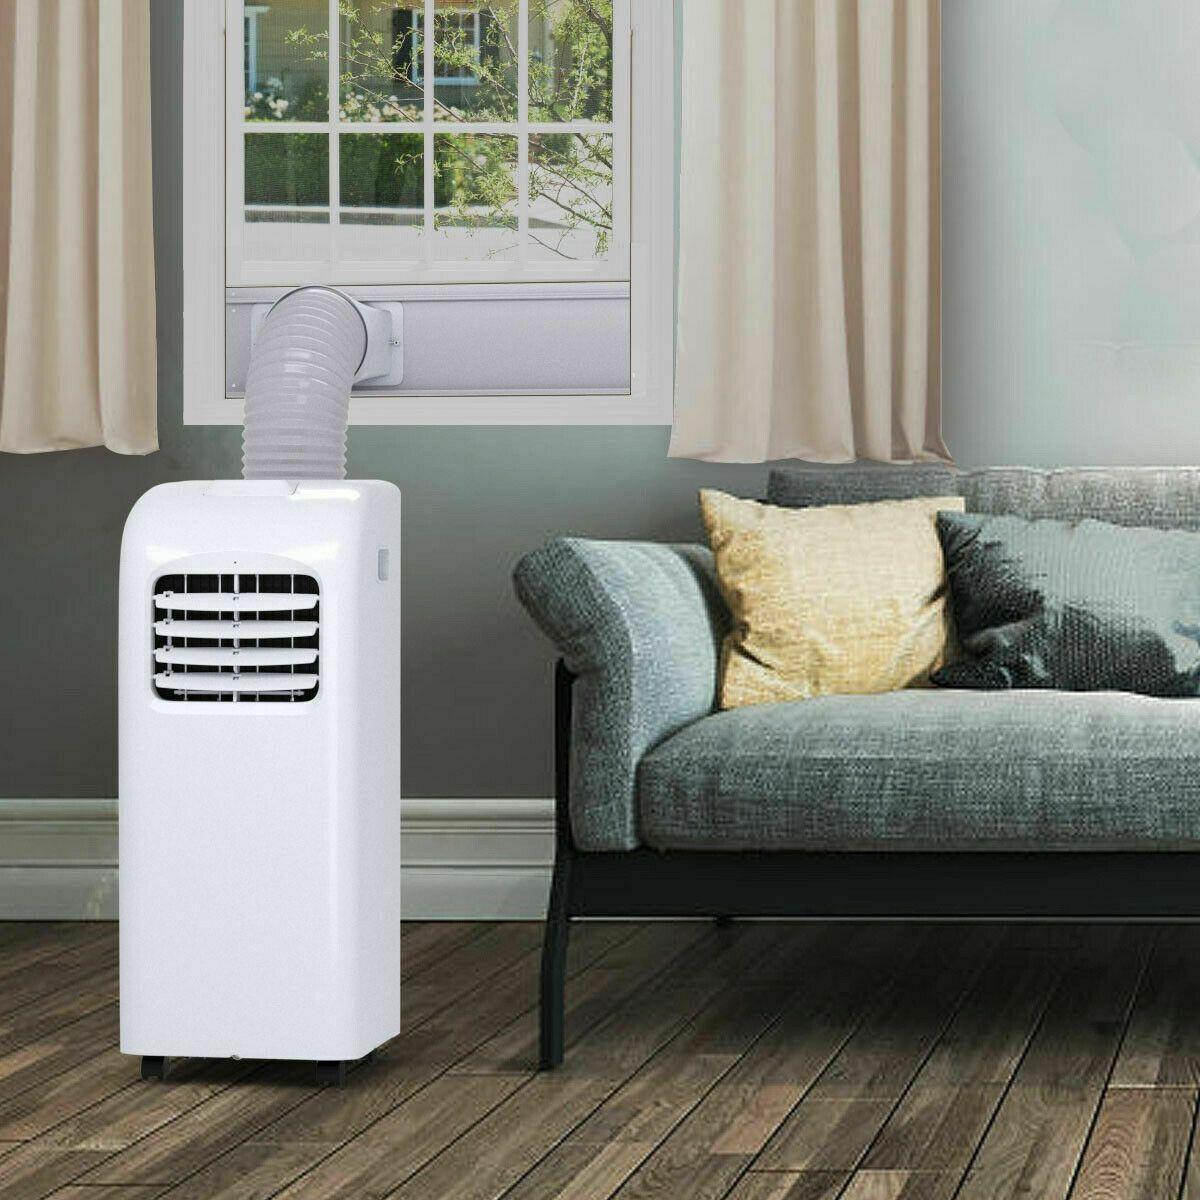 10000 BTU Portable Air Conditioner & Dehumidifier in 2020